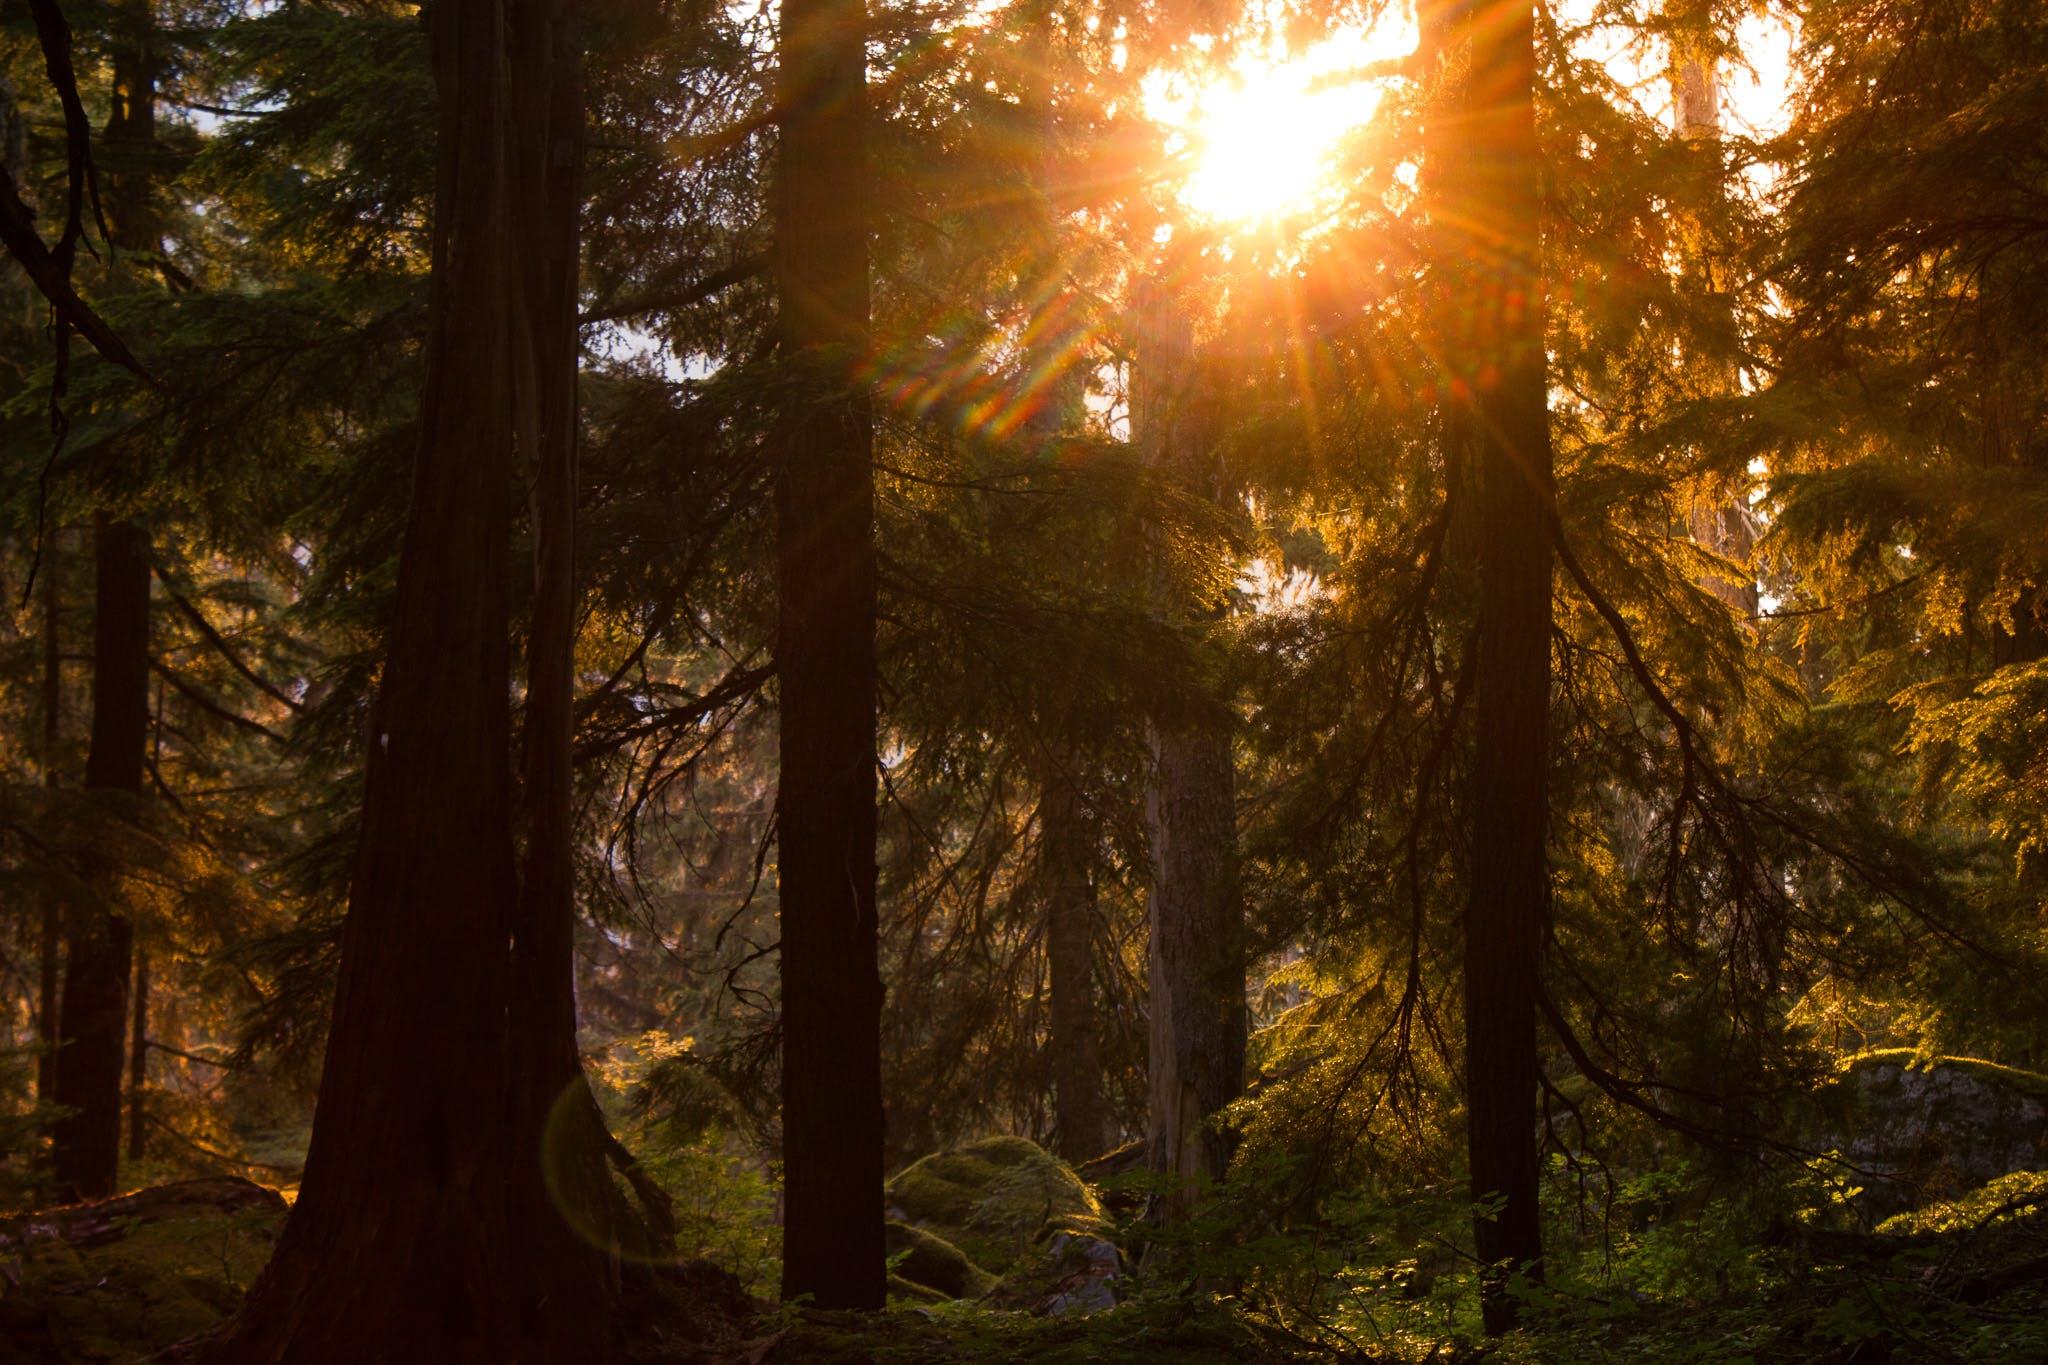 Glacier National Park's amazing forests